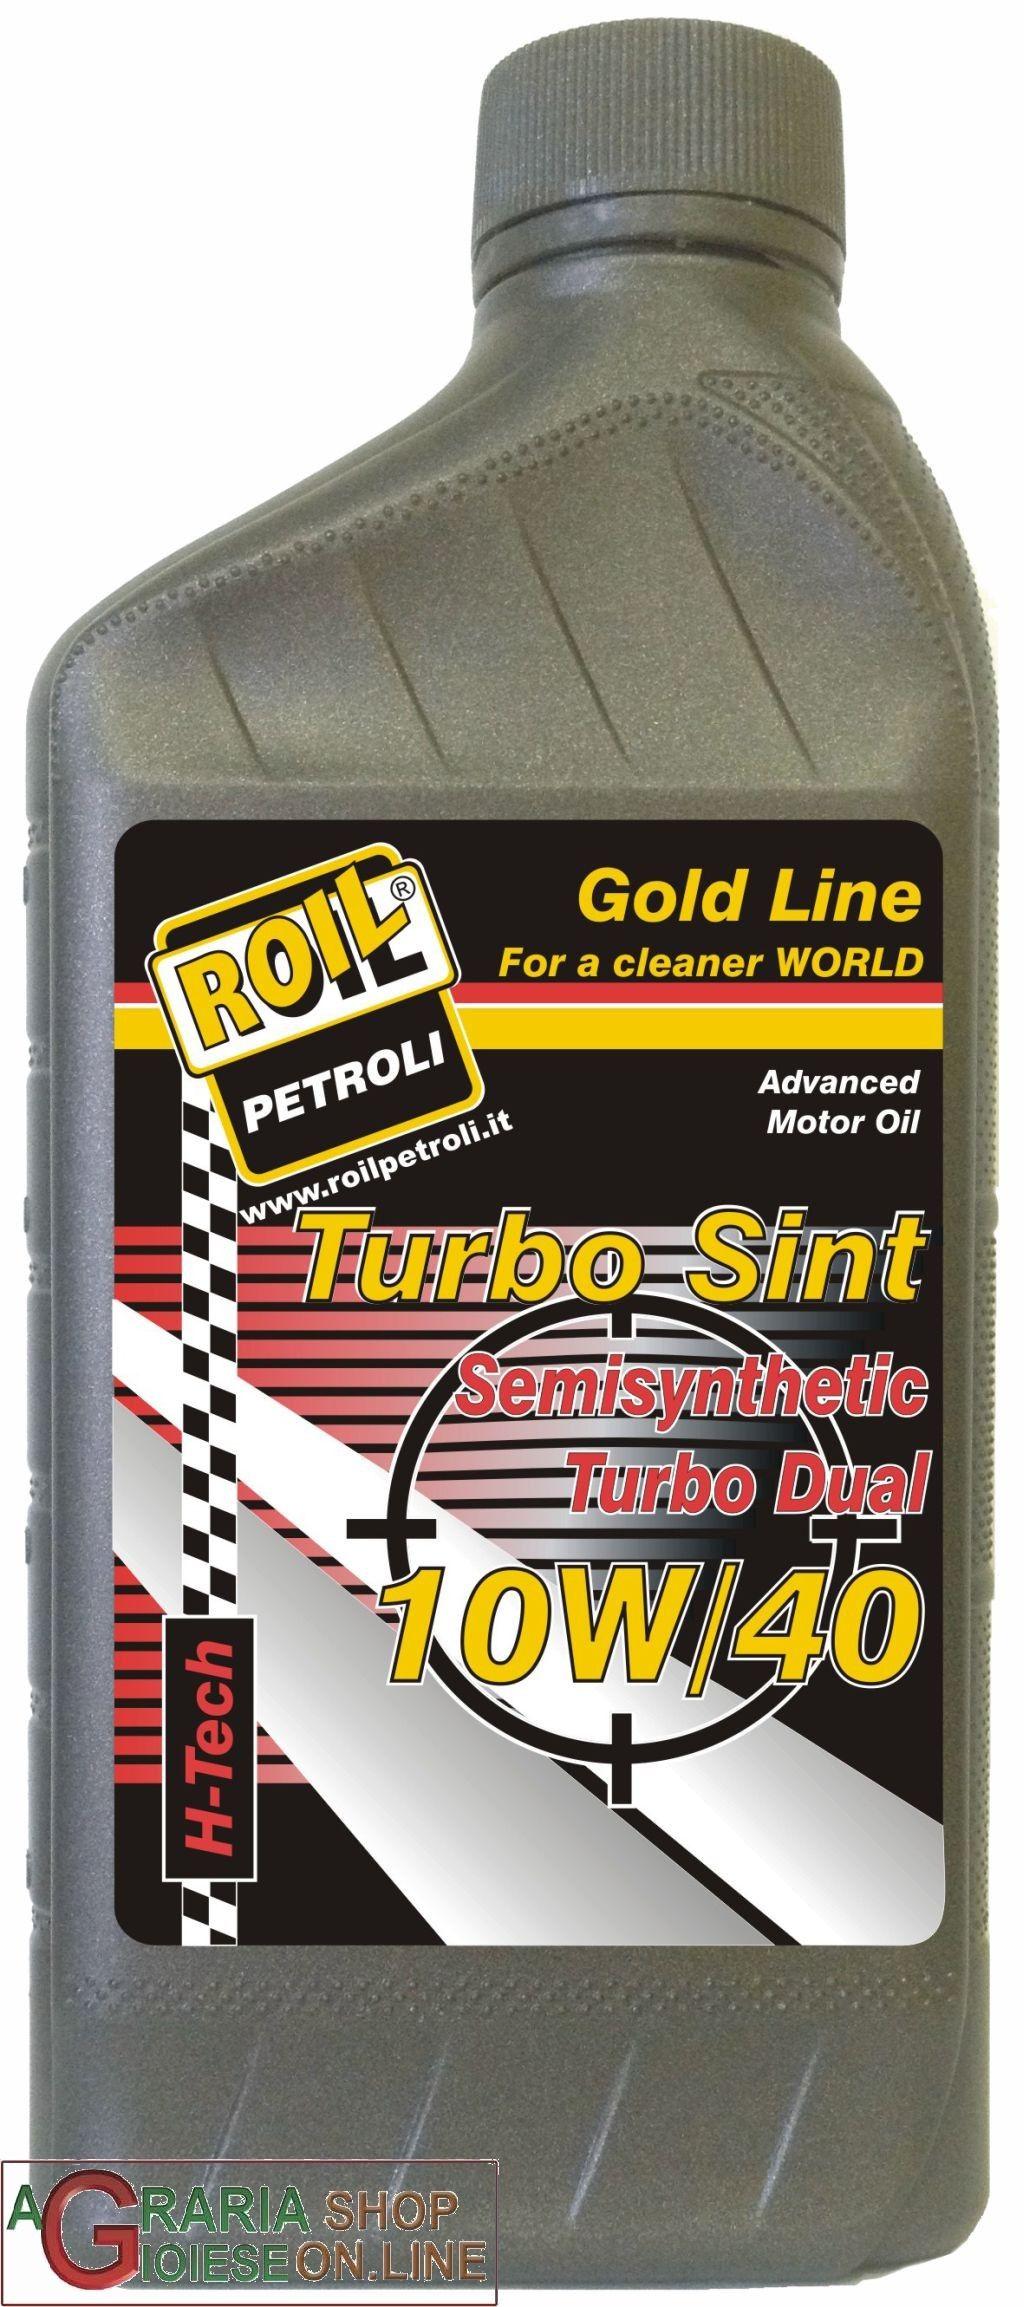 OLIO LUBRIFICANTE ROIL TURBO SINT10W40 LT.1 http://www.decariashop.it/oli-lubrificanti/12346-olio-lubrificante-roil-turbo-sint10w40-lt1.html